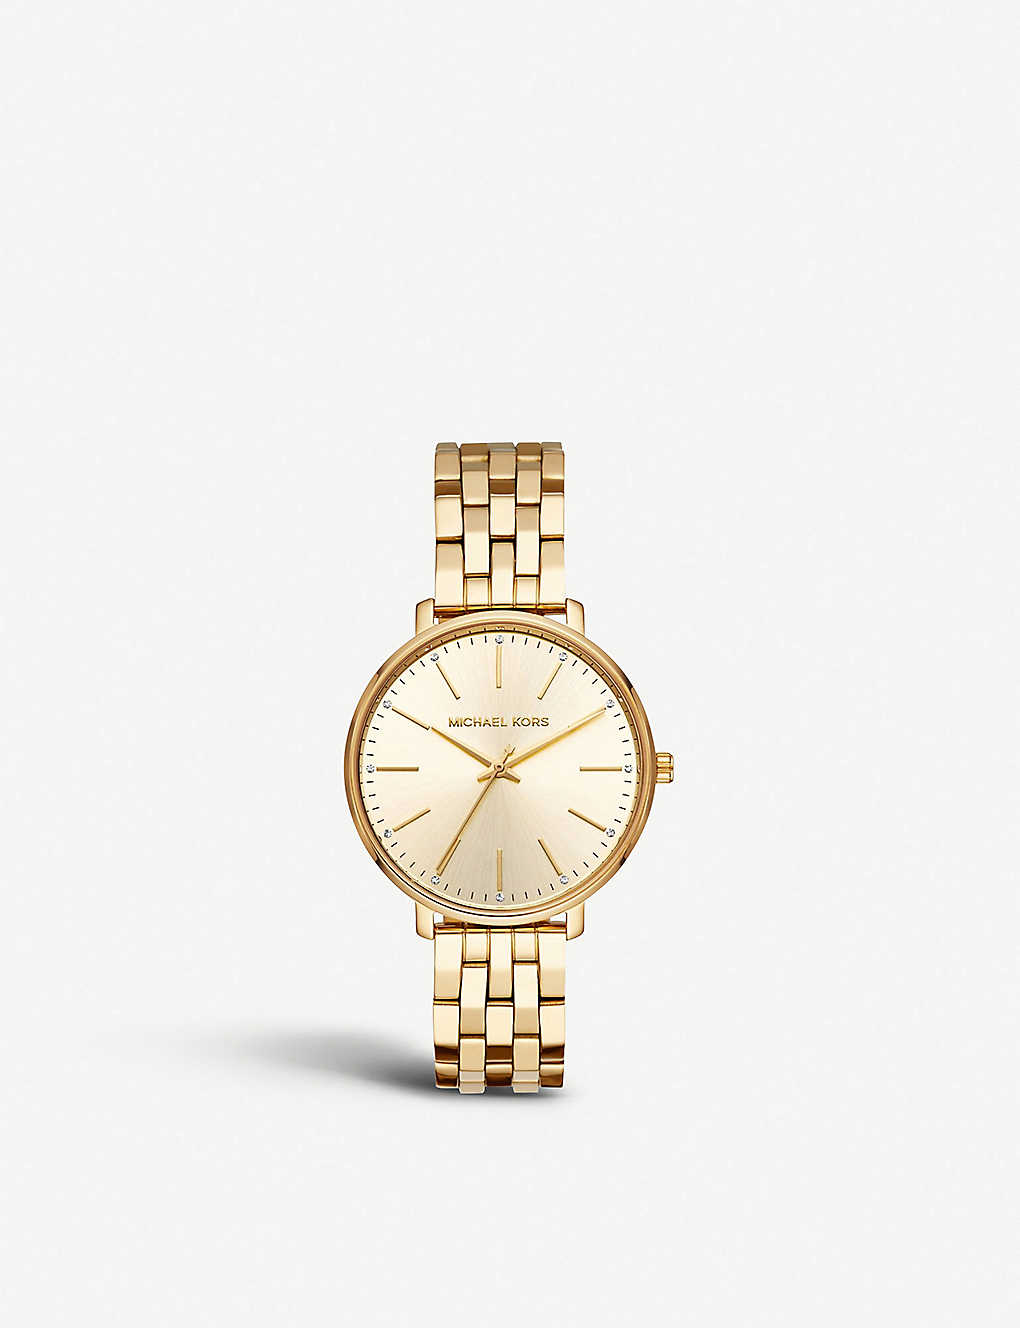 6d6bbc7178091 MICHAEL KORS - MK3898 Pyper gold-plated stainless steel watch ...